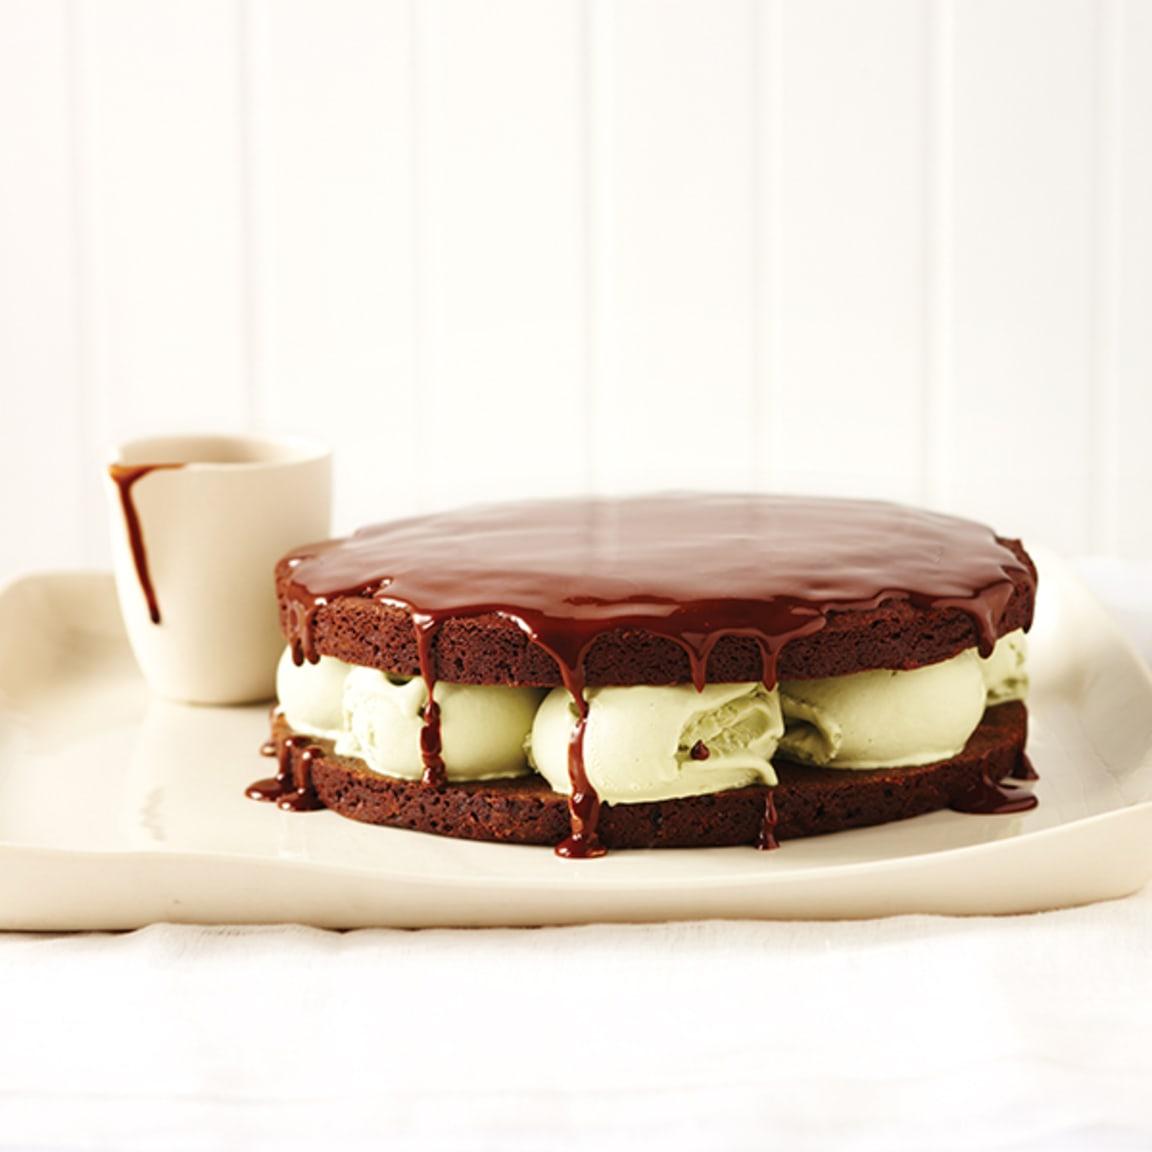 Chocolate and pistachio ice cream cake with hot chocolate sauce